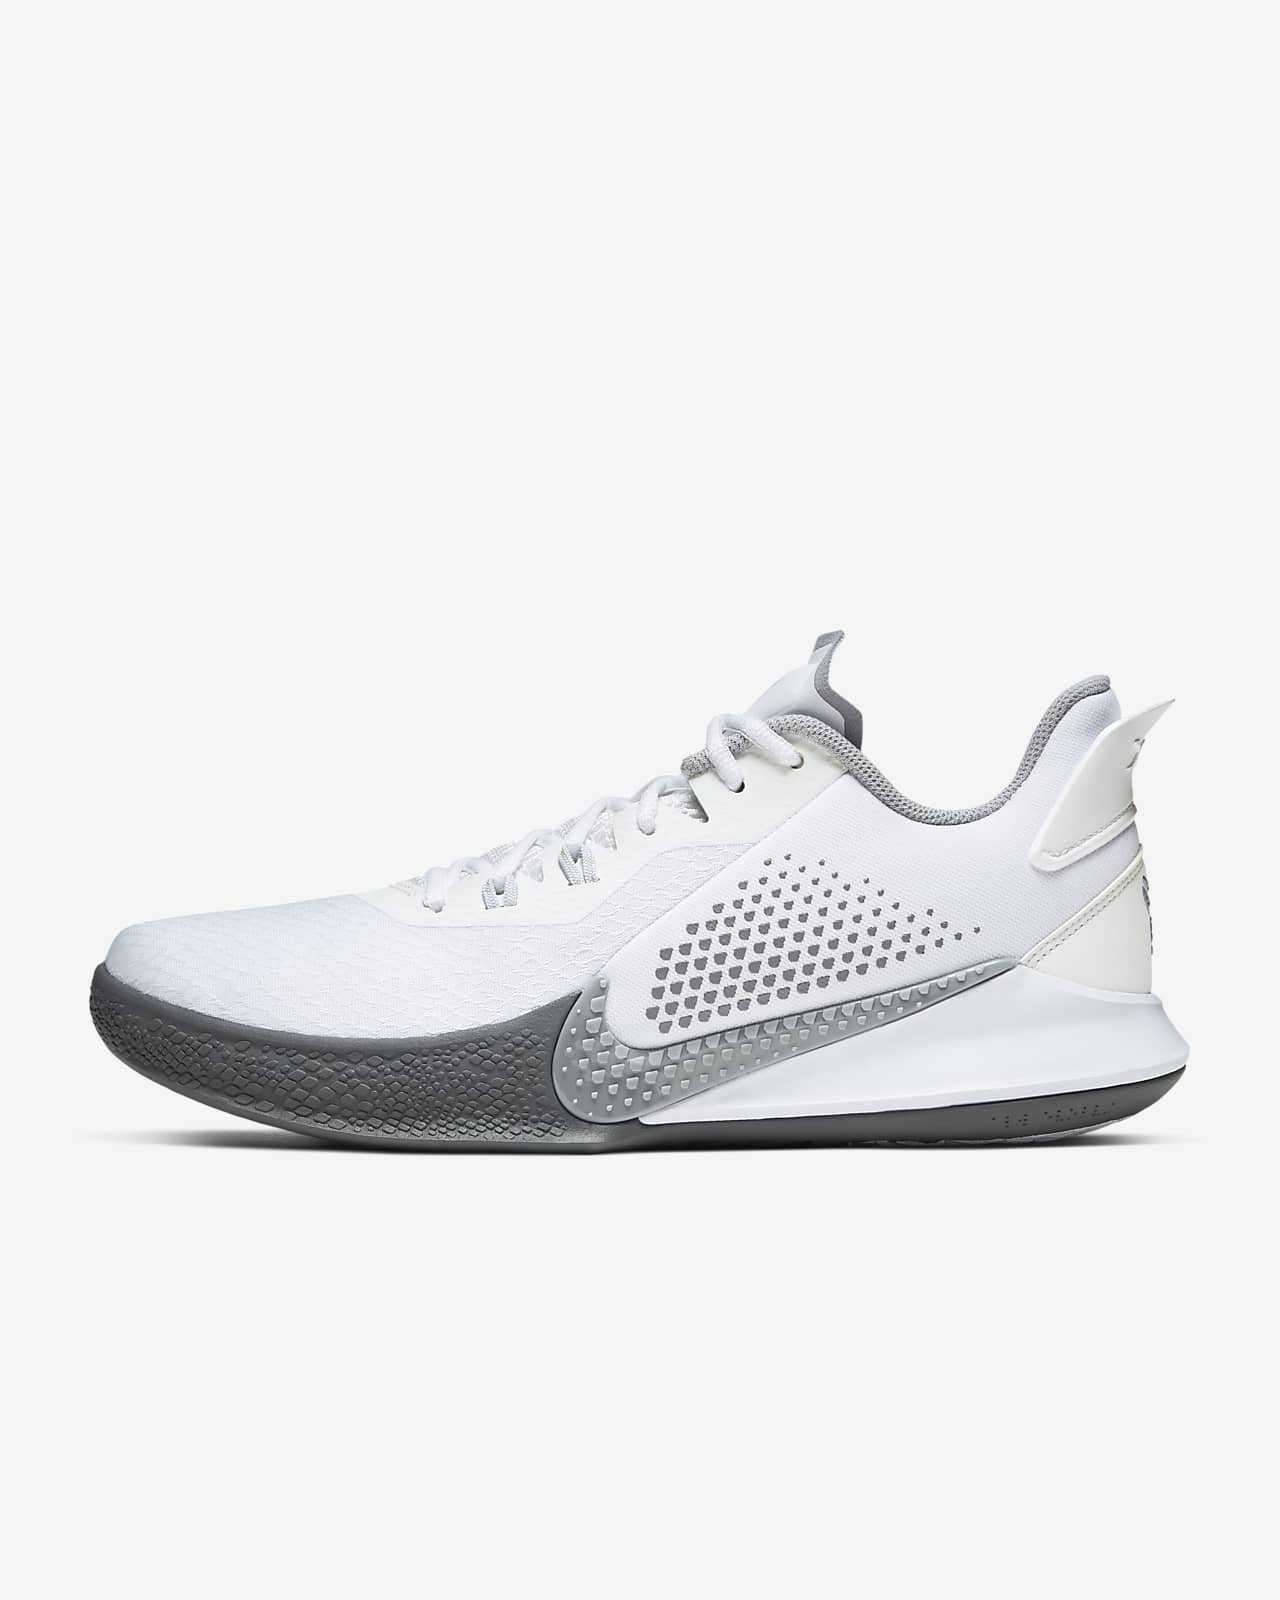 Mamba Fury Basketball Shoe. Nike NL